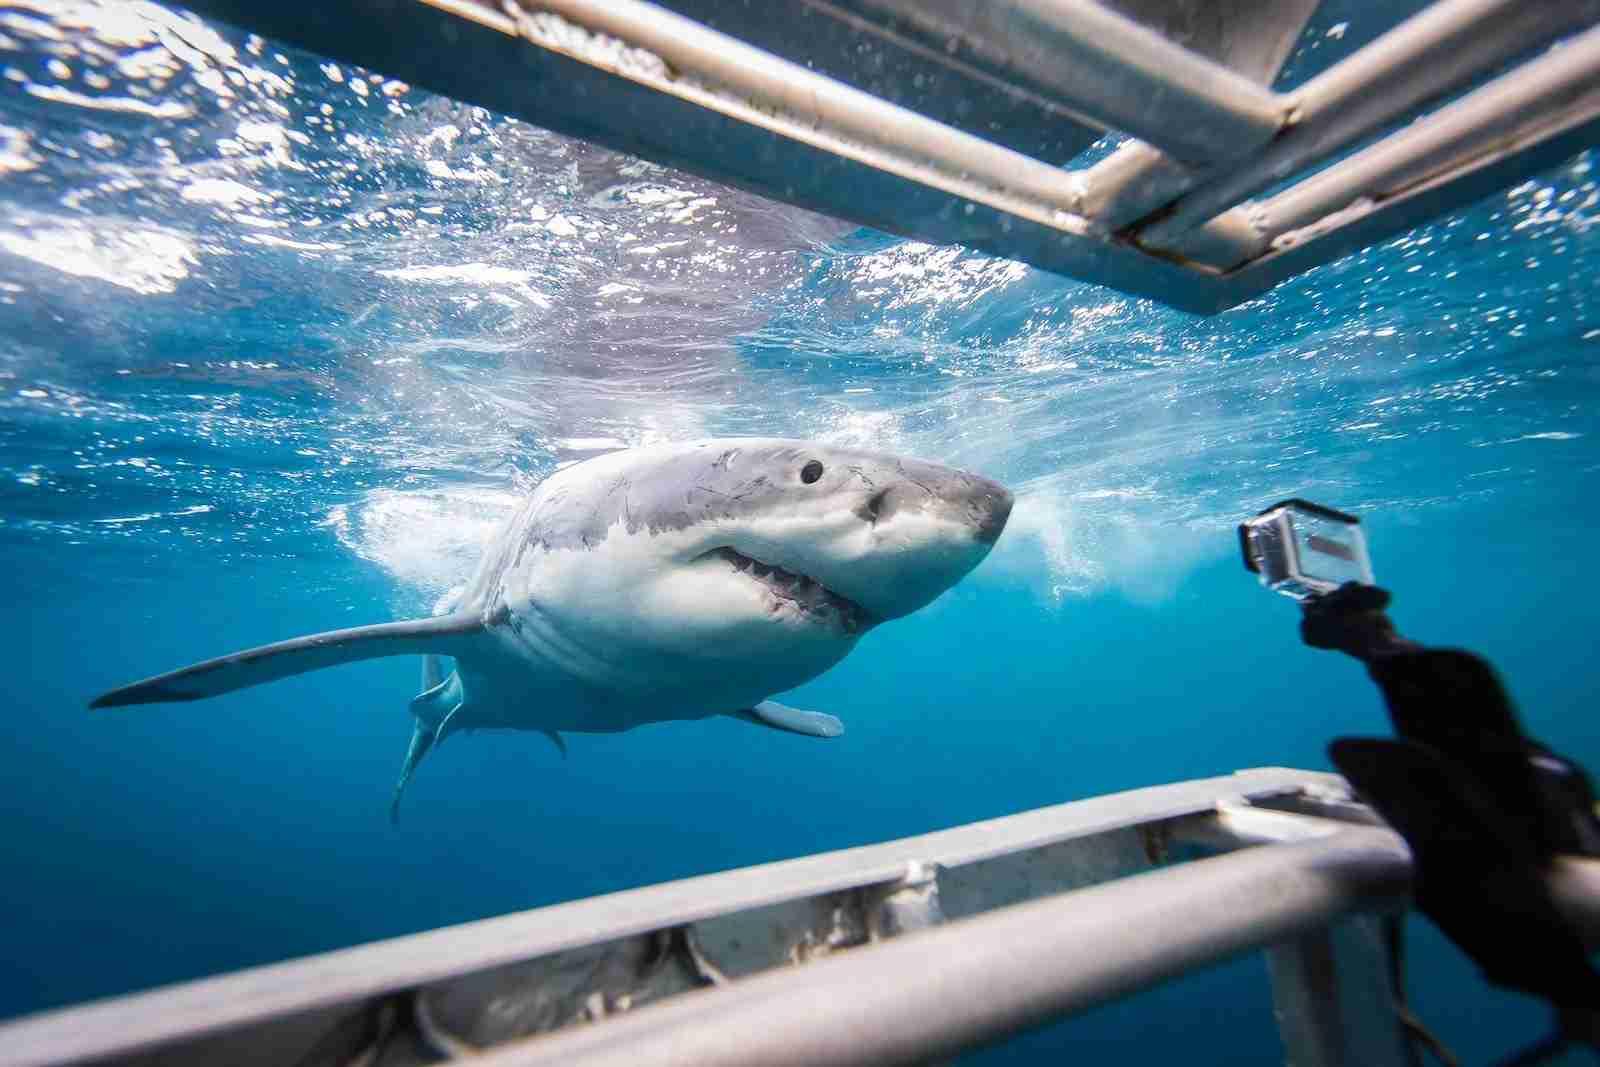 (Photo credit Brad Leue / Barcroft Images / Barcroft Media via Getty Images)